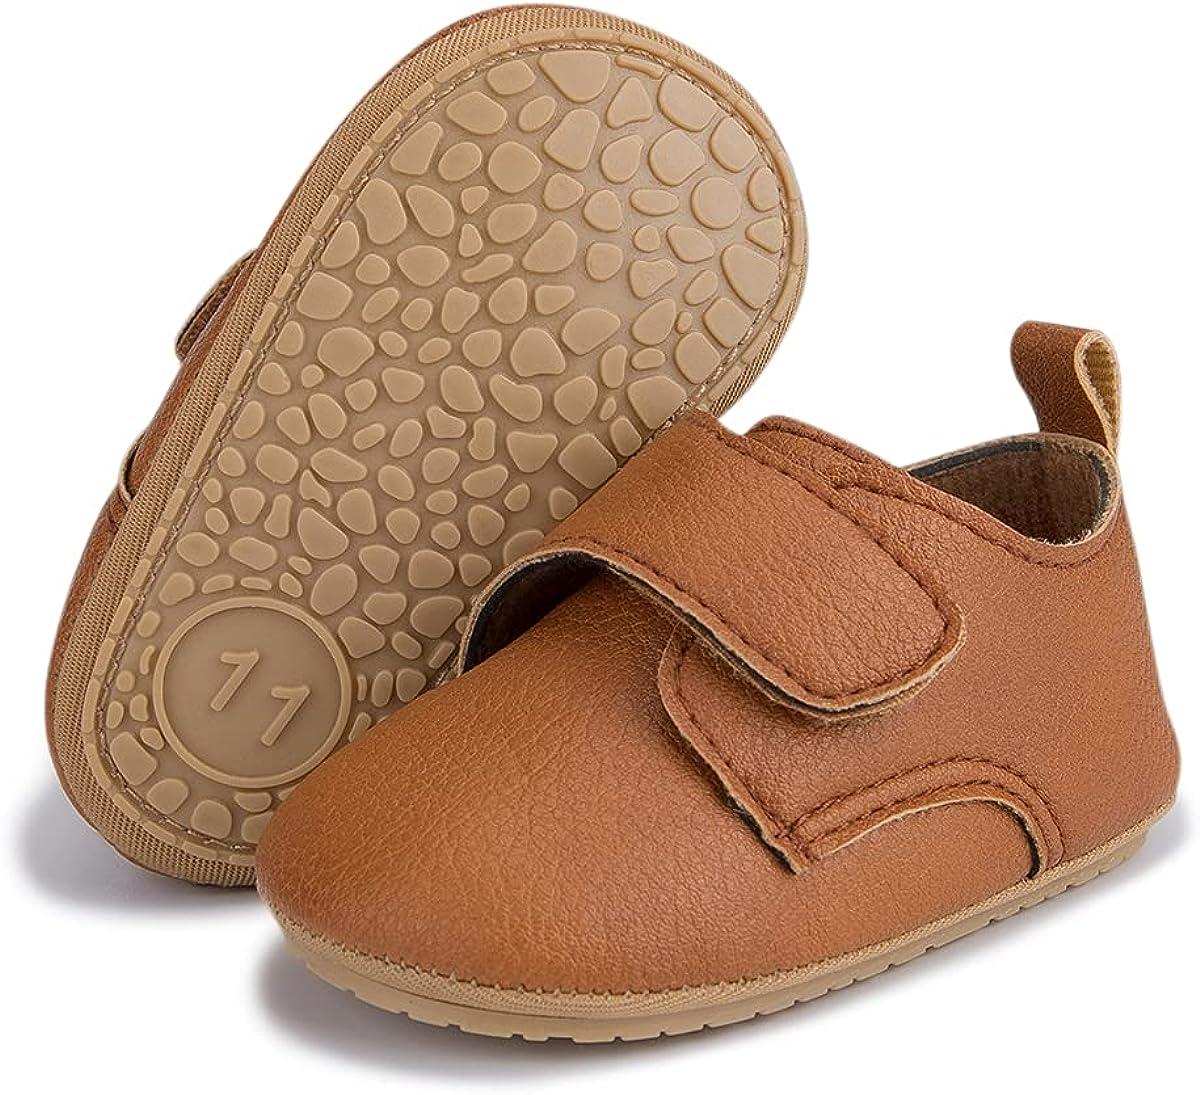 HsdsBebeBabyBoysGirlsOxfordShoesPULeatherSoftRubberSoleSneakersAnti-SlipToddlerAnkleBootsInfantWalkingShoes Moccasins